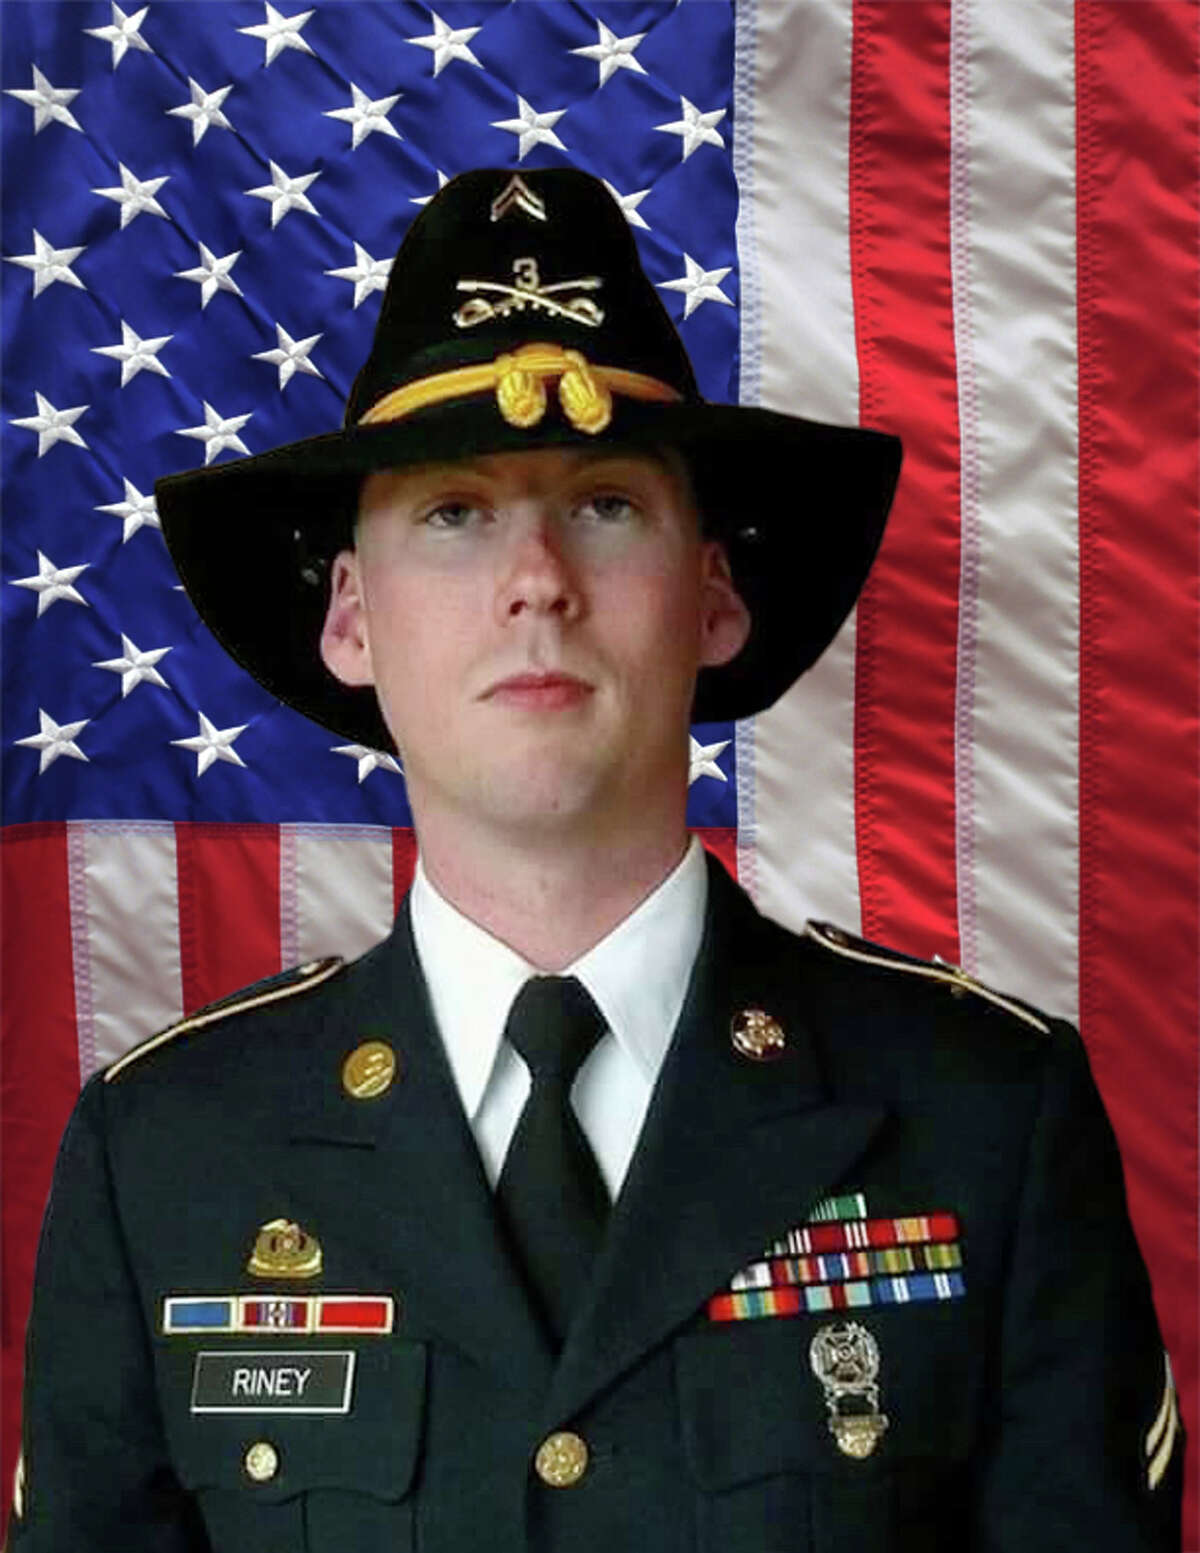 Sgt. Douglas J. Riney, 26, died in Kabul, Afghanistan, on Thursday.